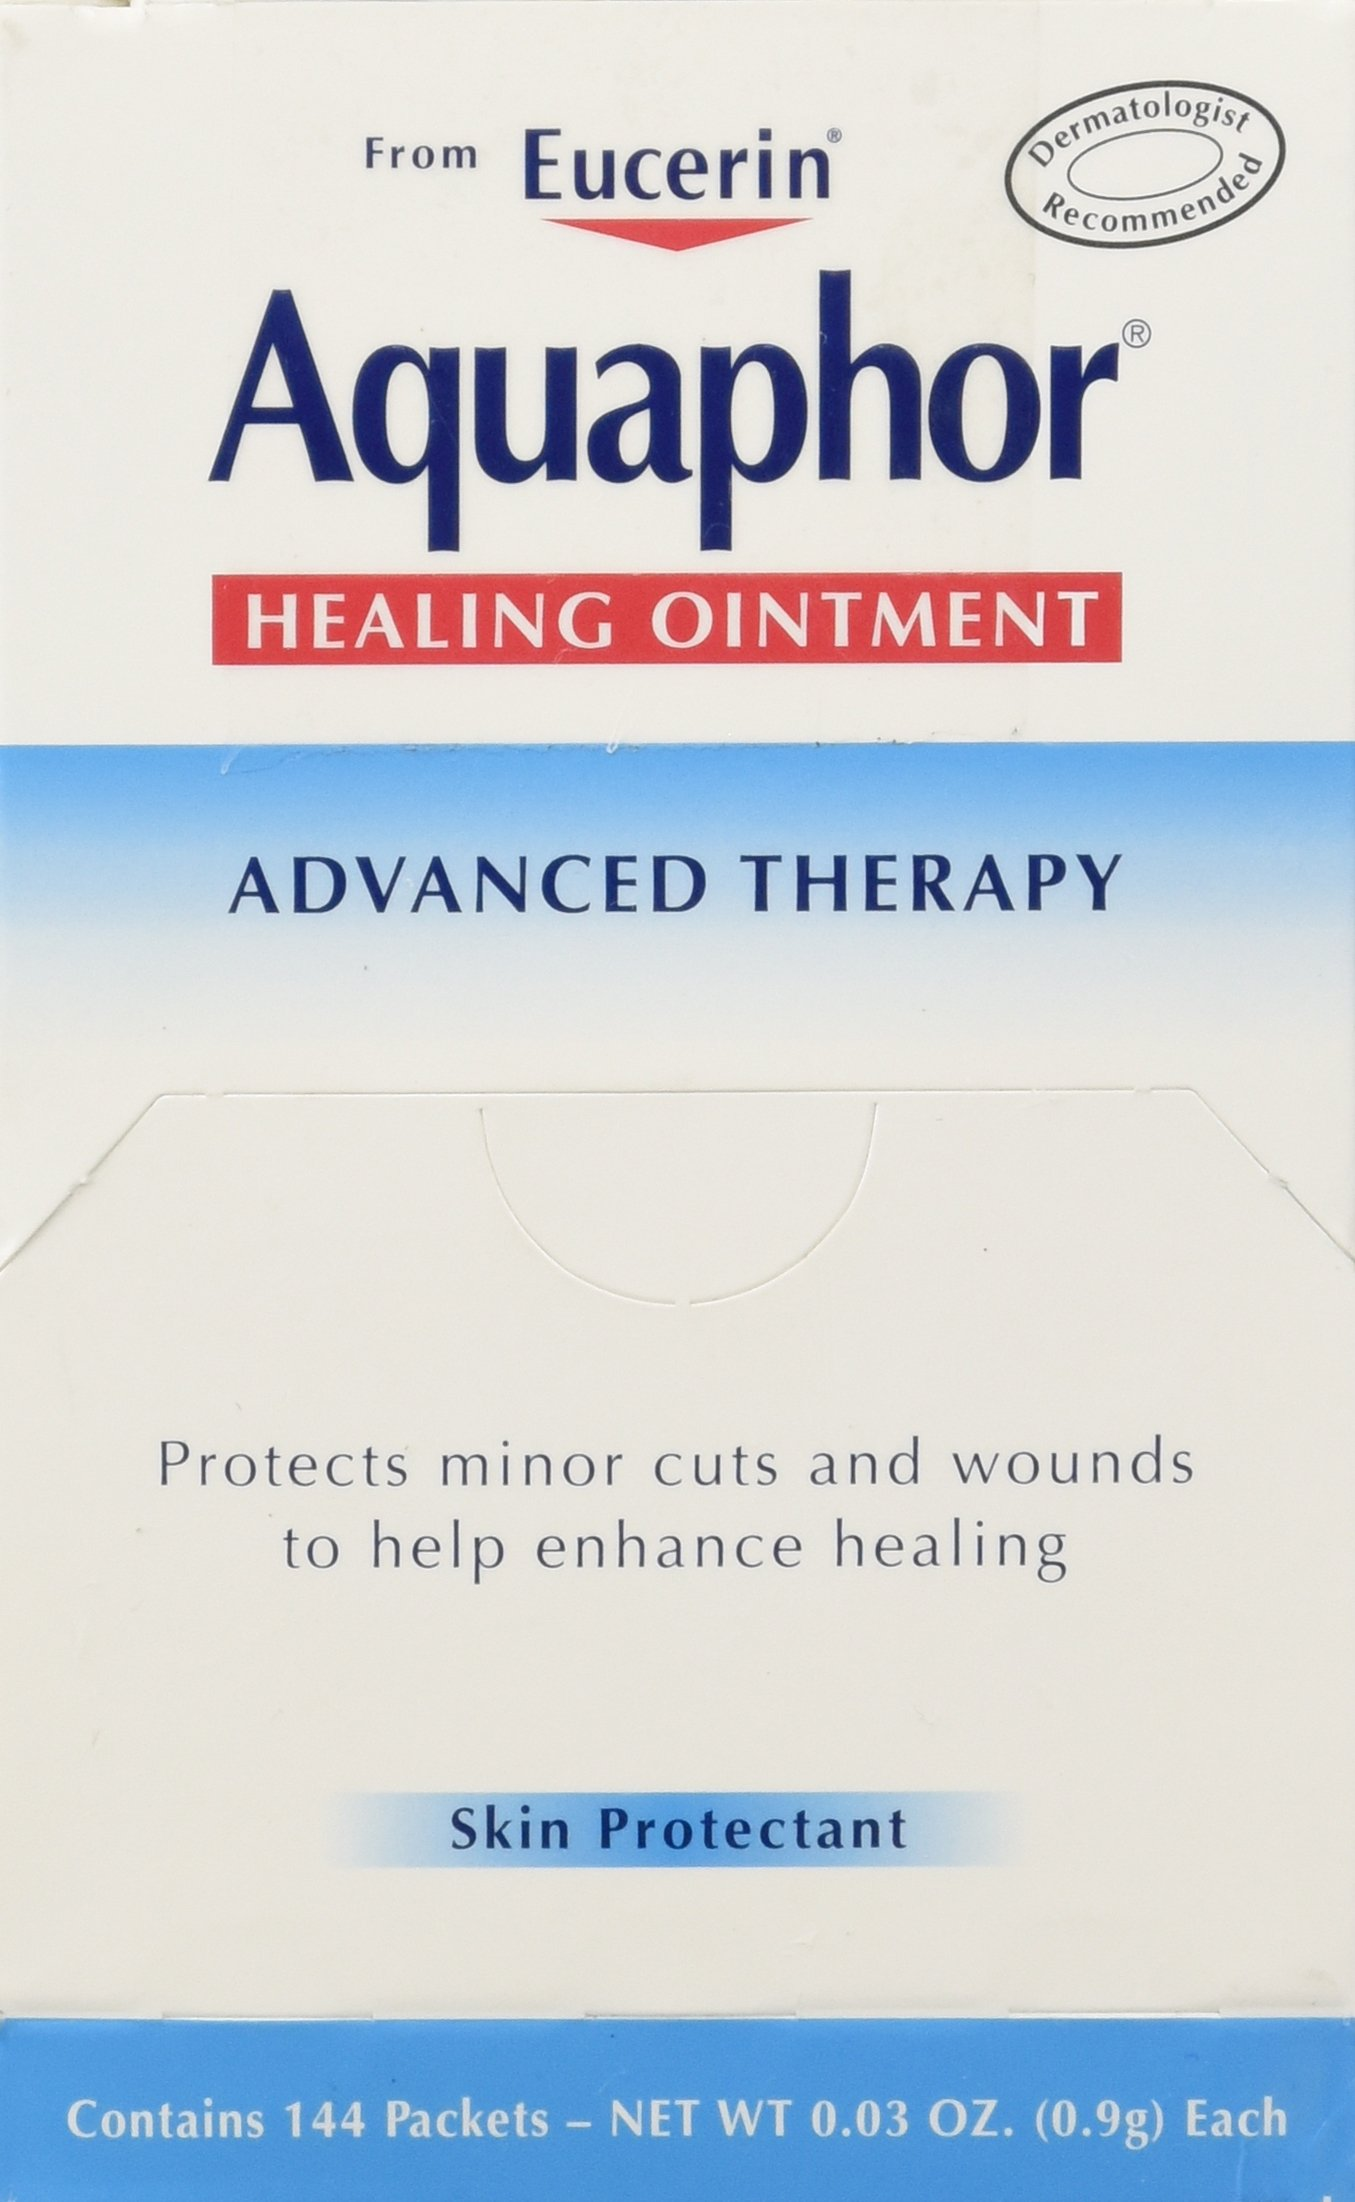 BEIERSDORF Aquaphor Foil Ointments Packets, Net Wt 0.03oz , 144 Count by BEIERSDORF